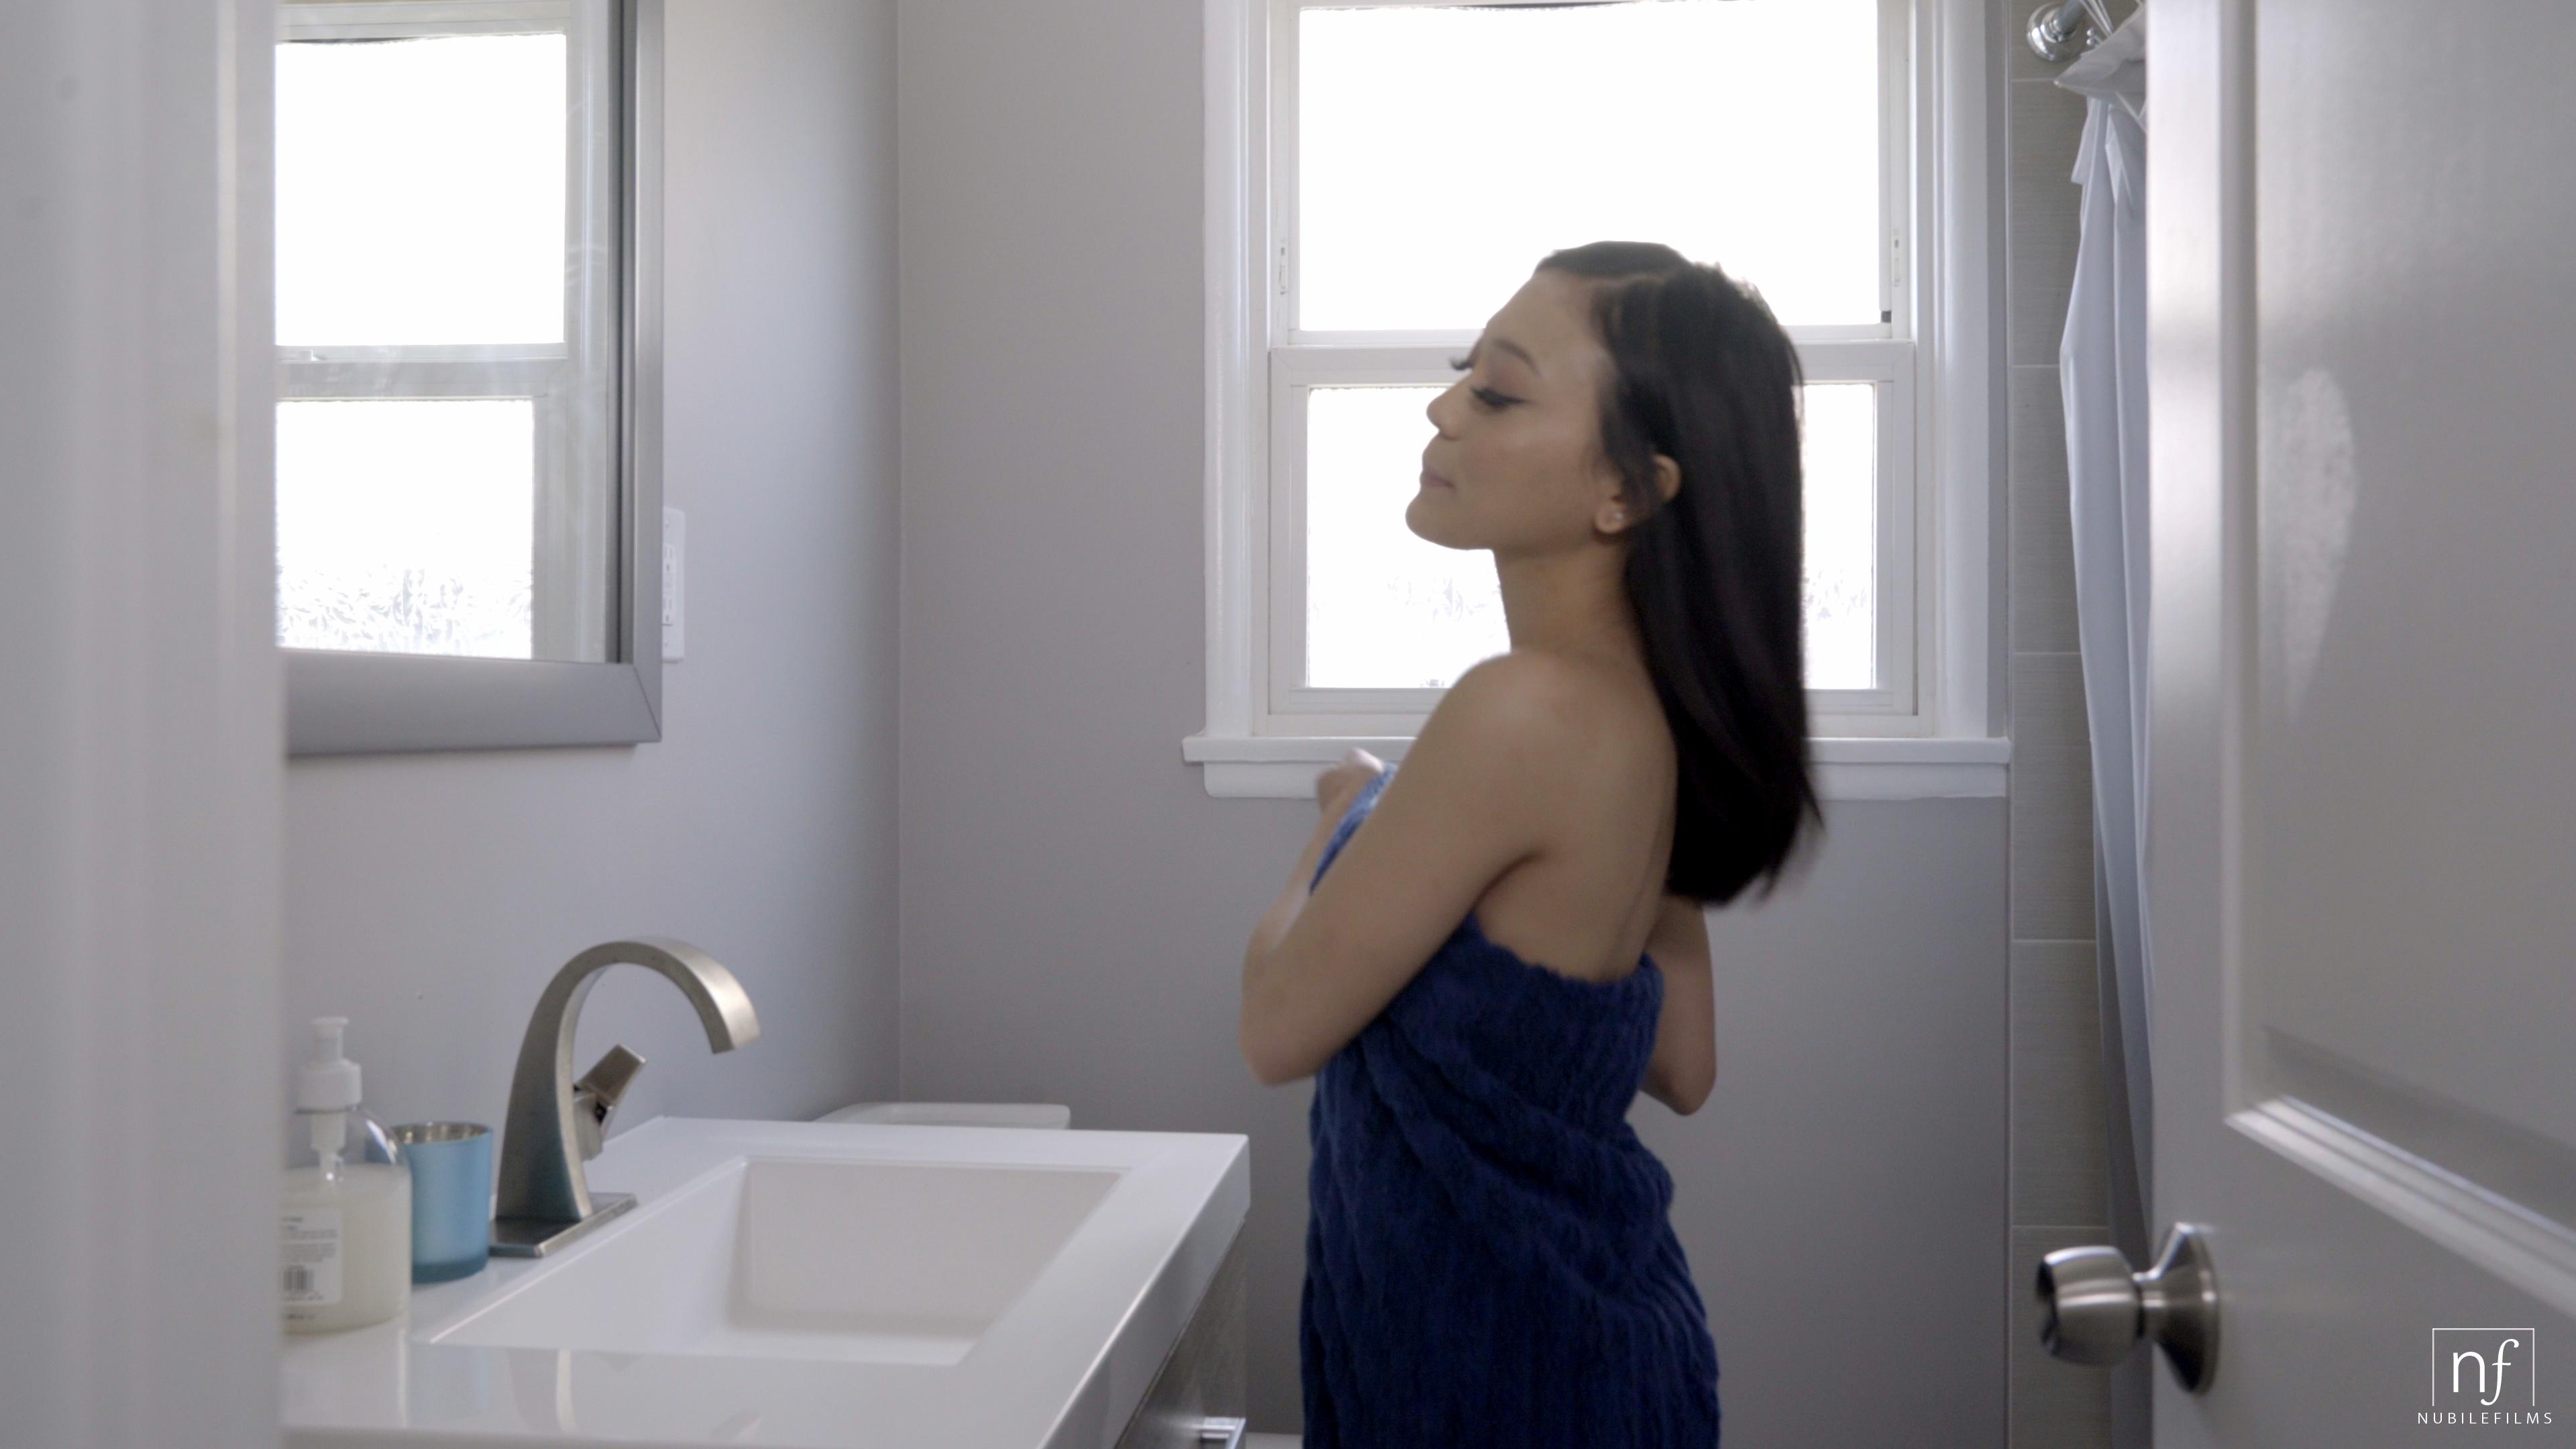 NubileFilms.com - Jasmine Grey,Lucas Frost: Secrets We Keep - S31:E21